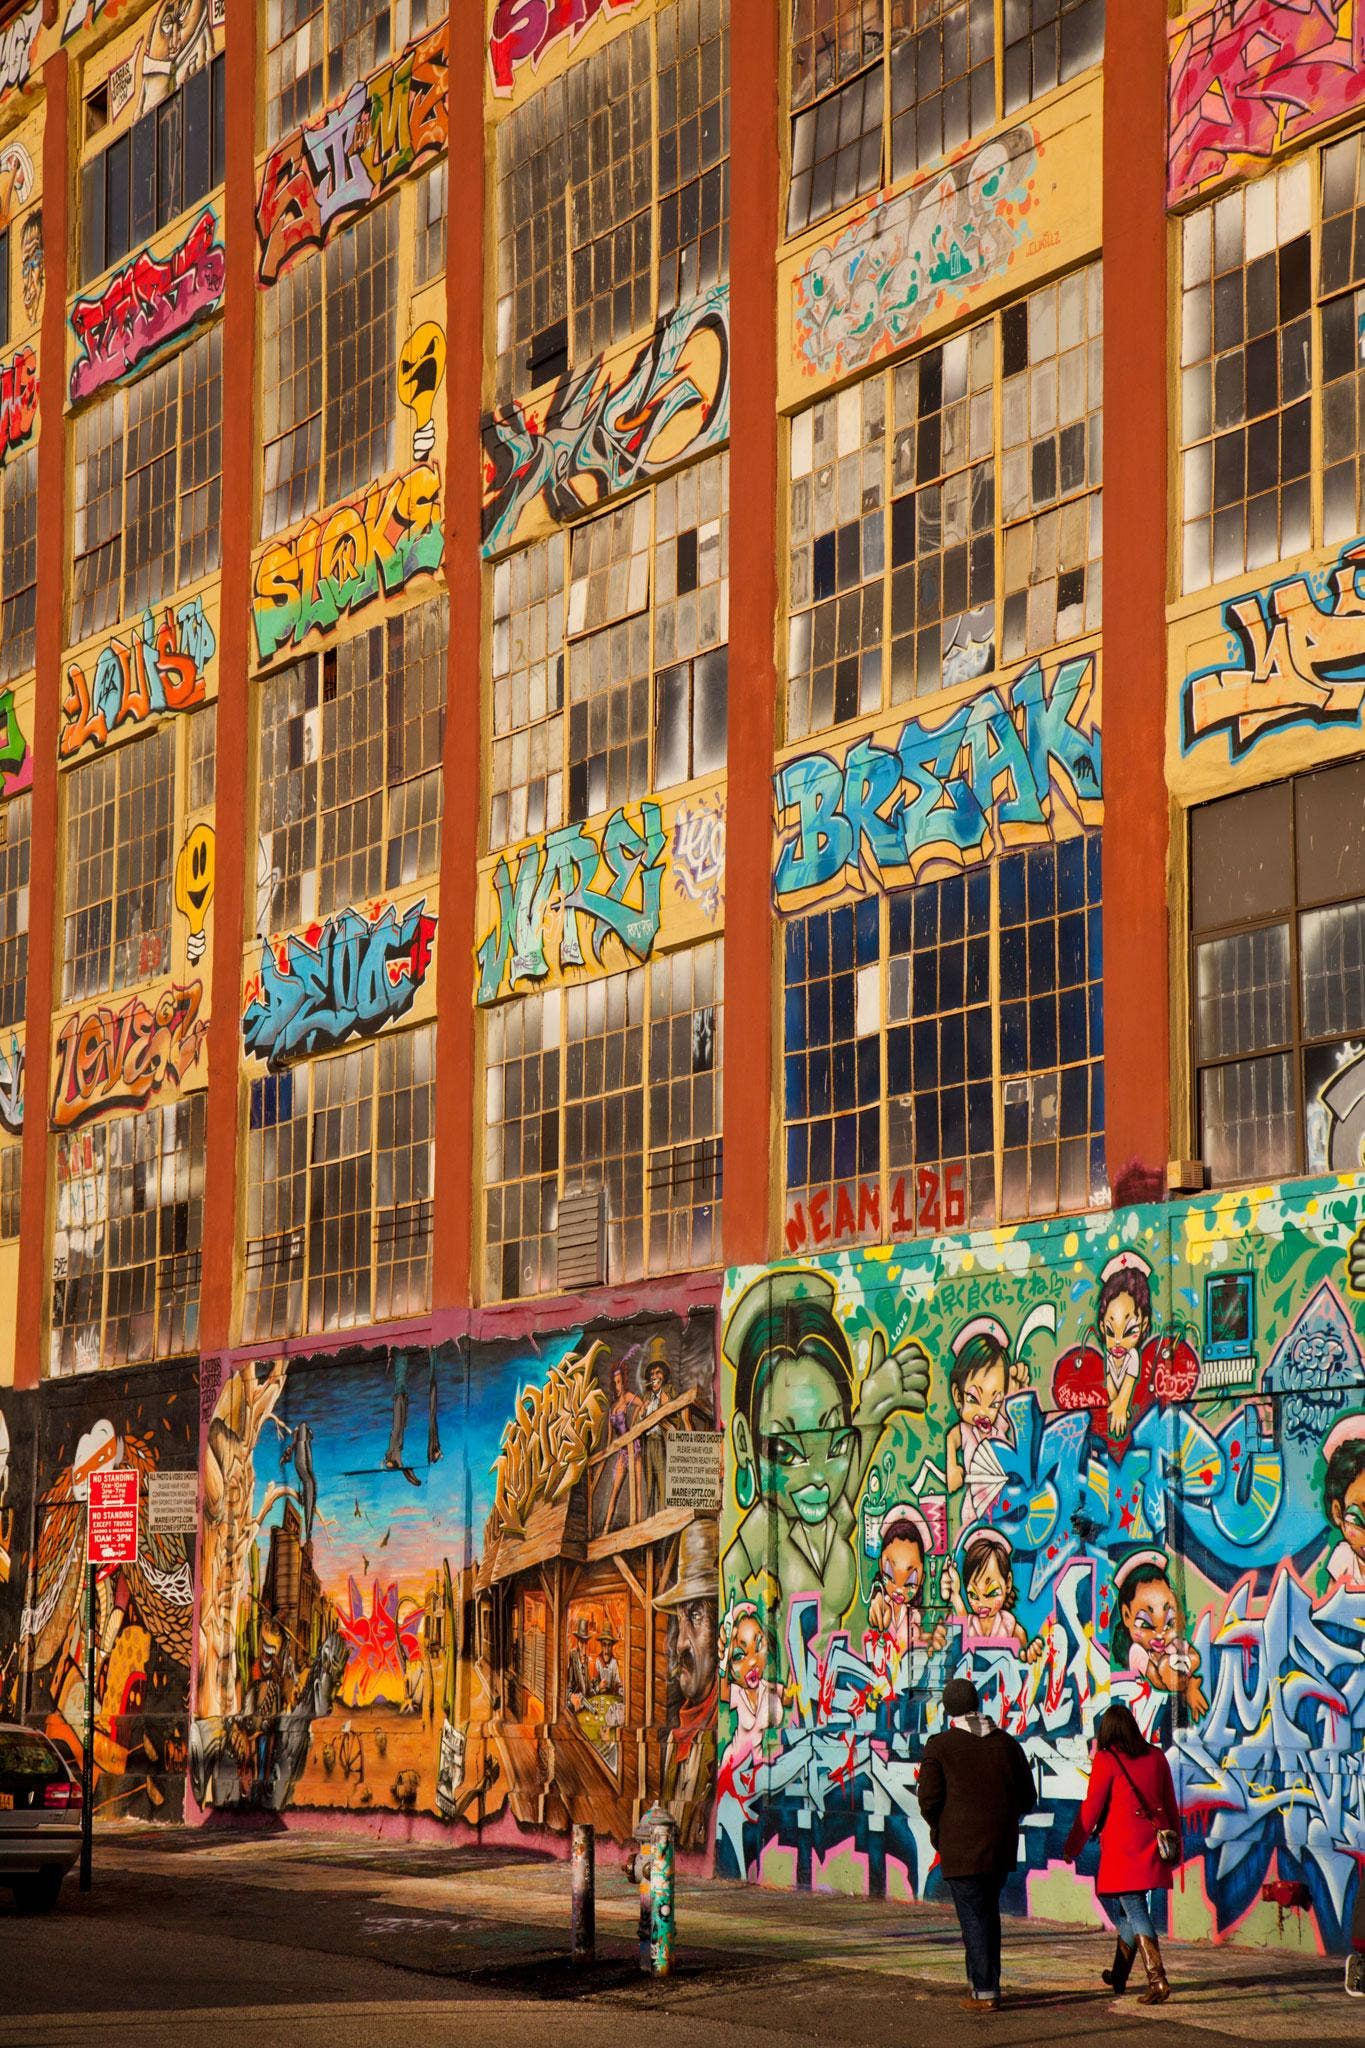 American graffiti: Five Pointz building, in Queens, New York